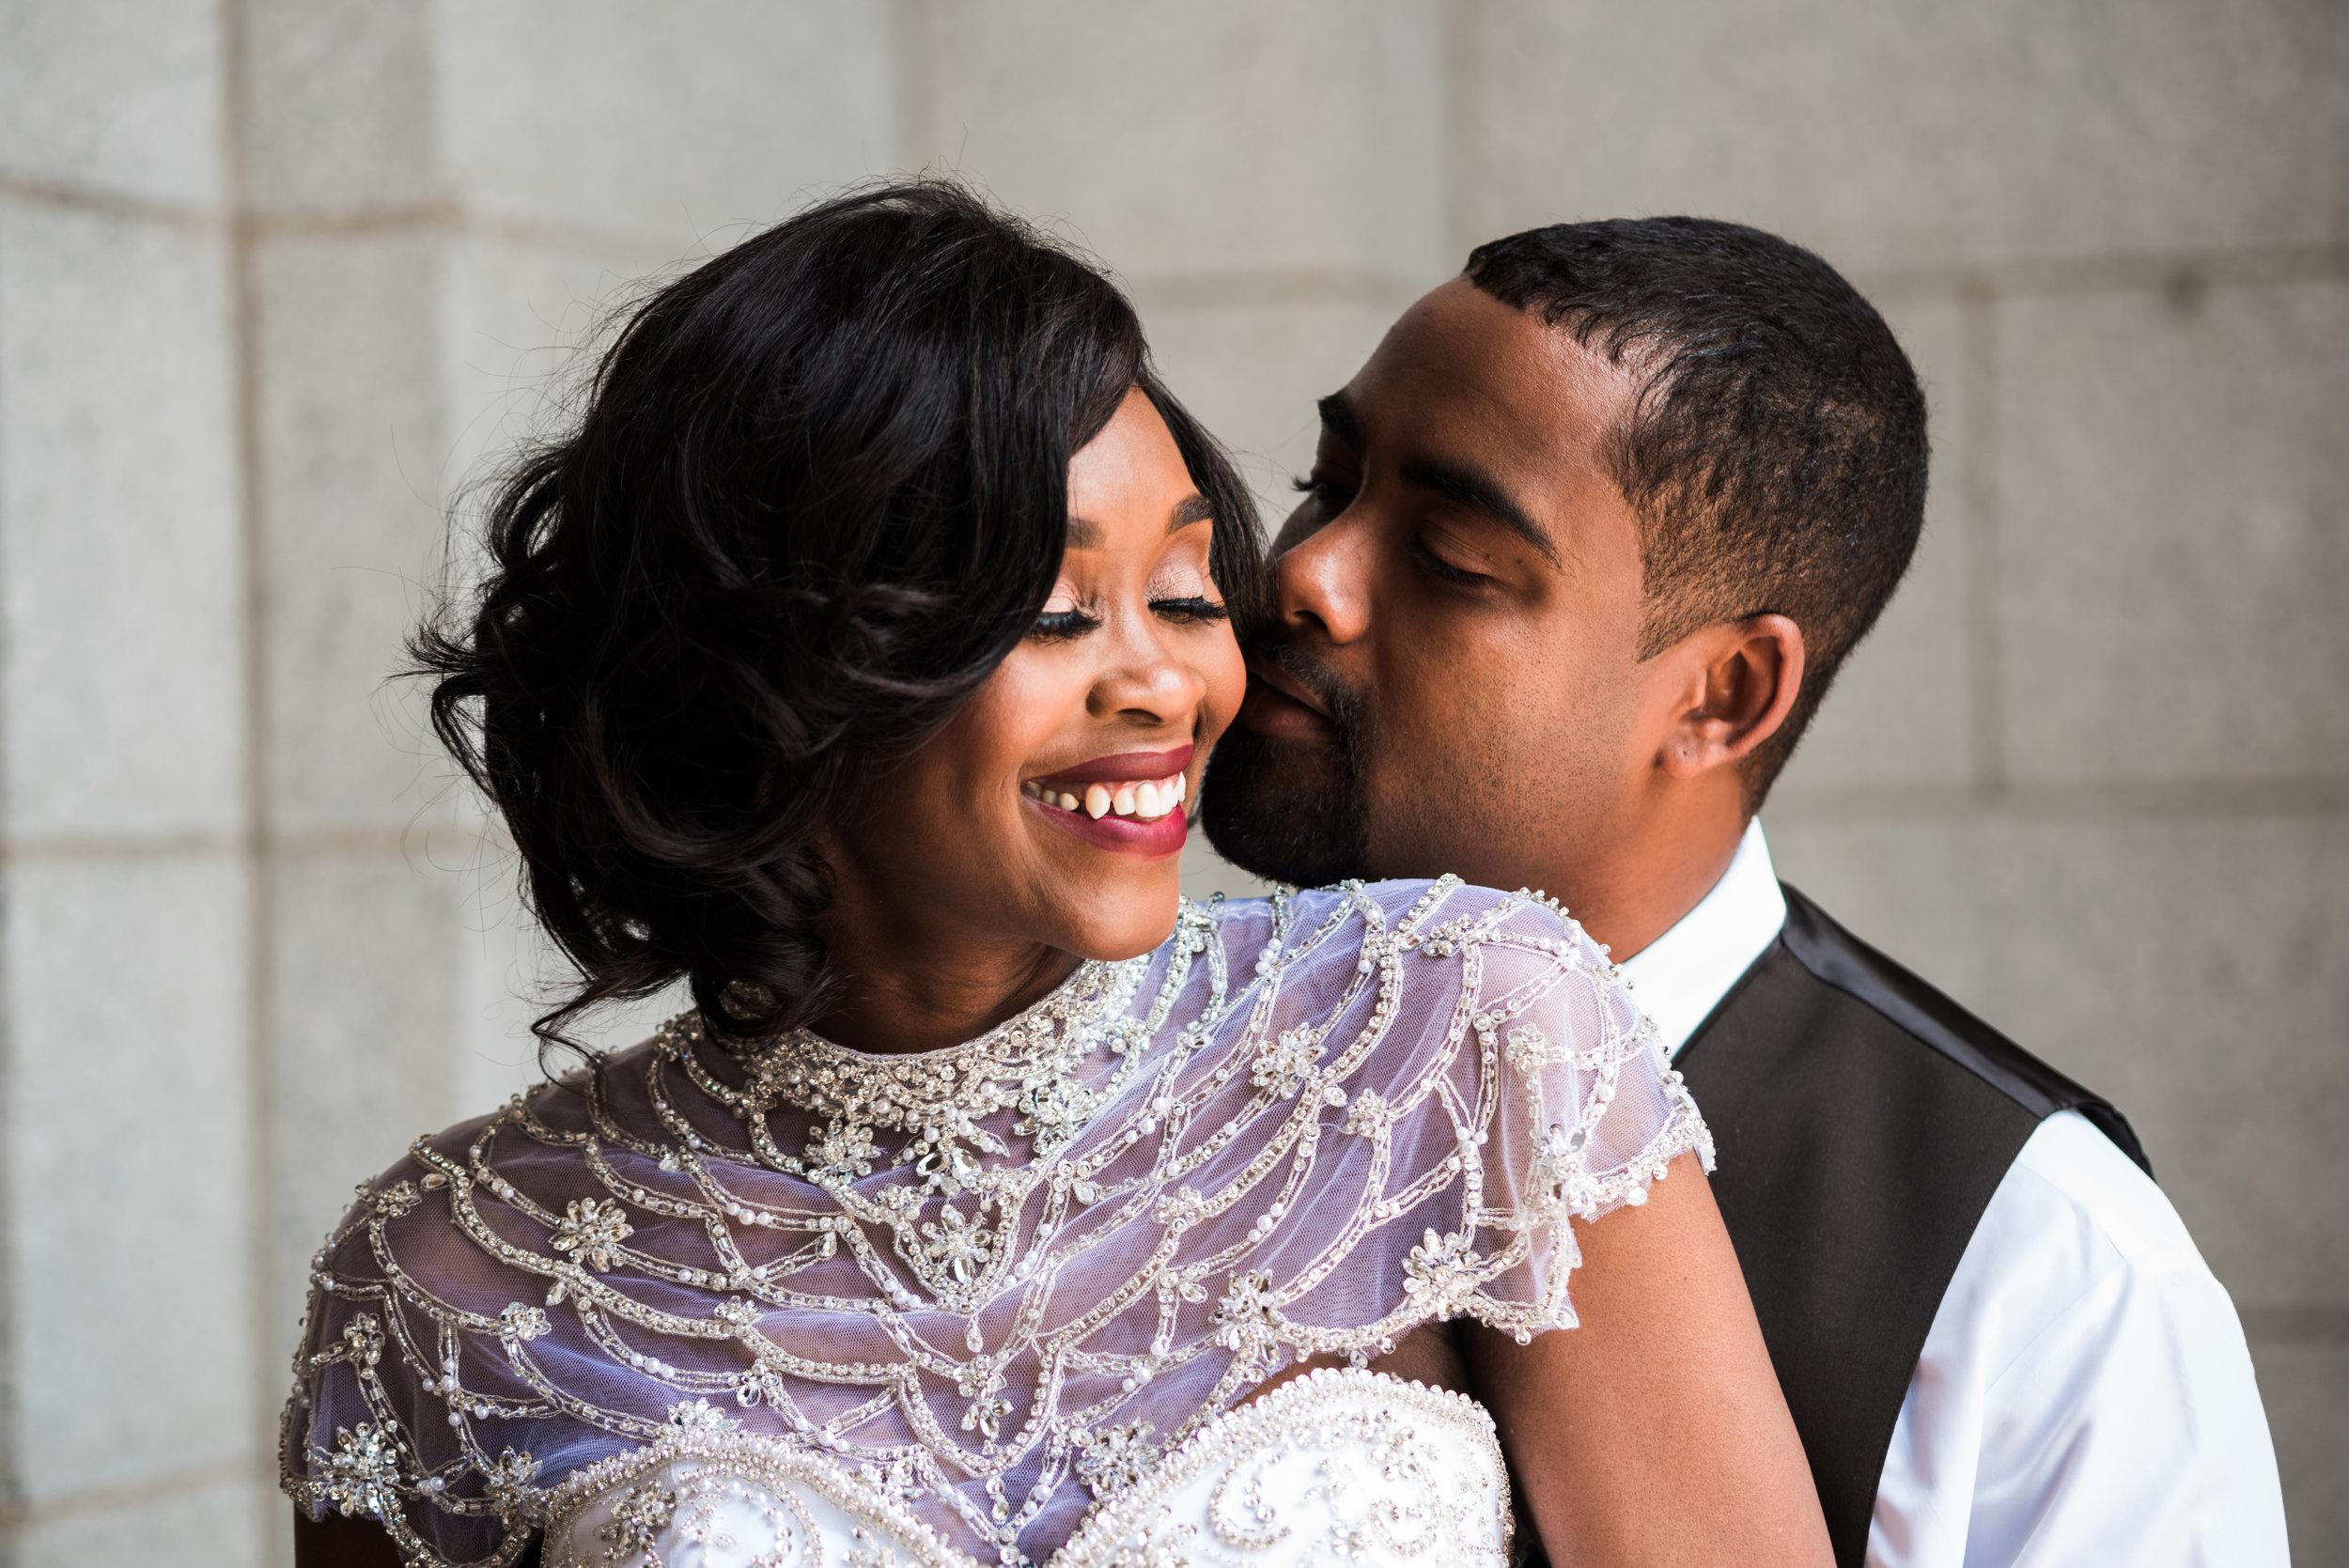 st-louis-wedding-photographer-orlandos-1-3.jpg